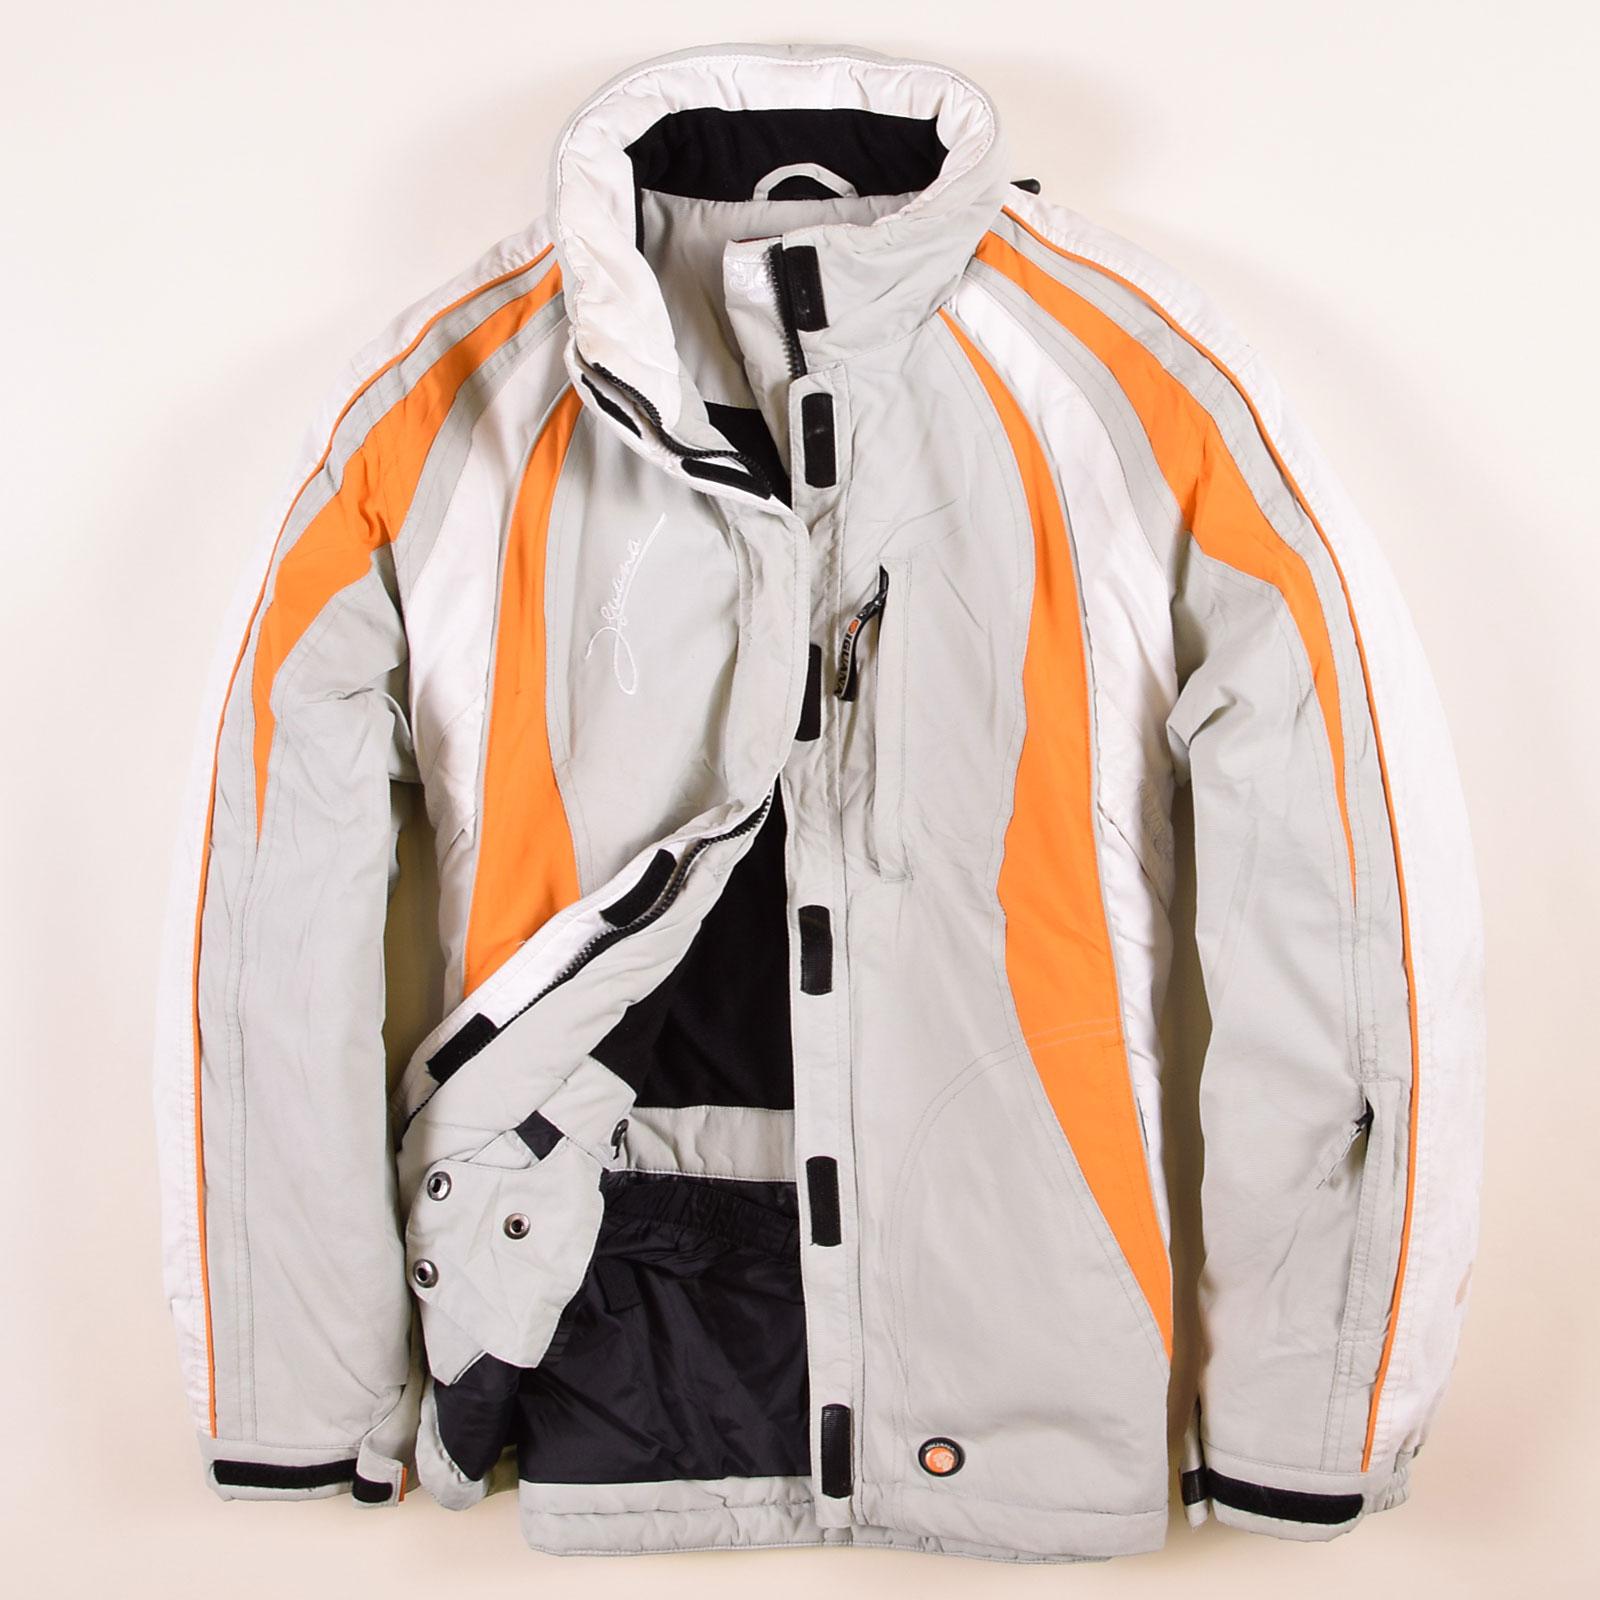 42 About Mehrfarbig58981 Iguana Damen Skijacke Jacke Jacket Gr Details 53LRqAj4